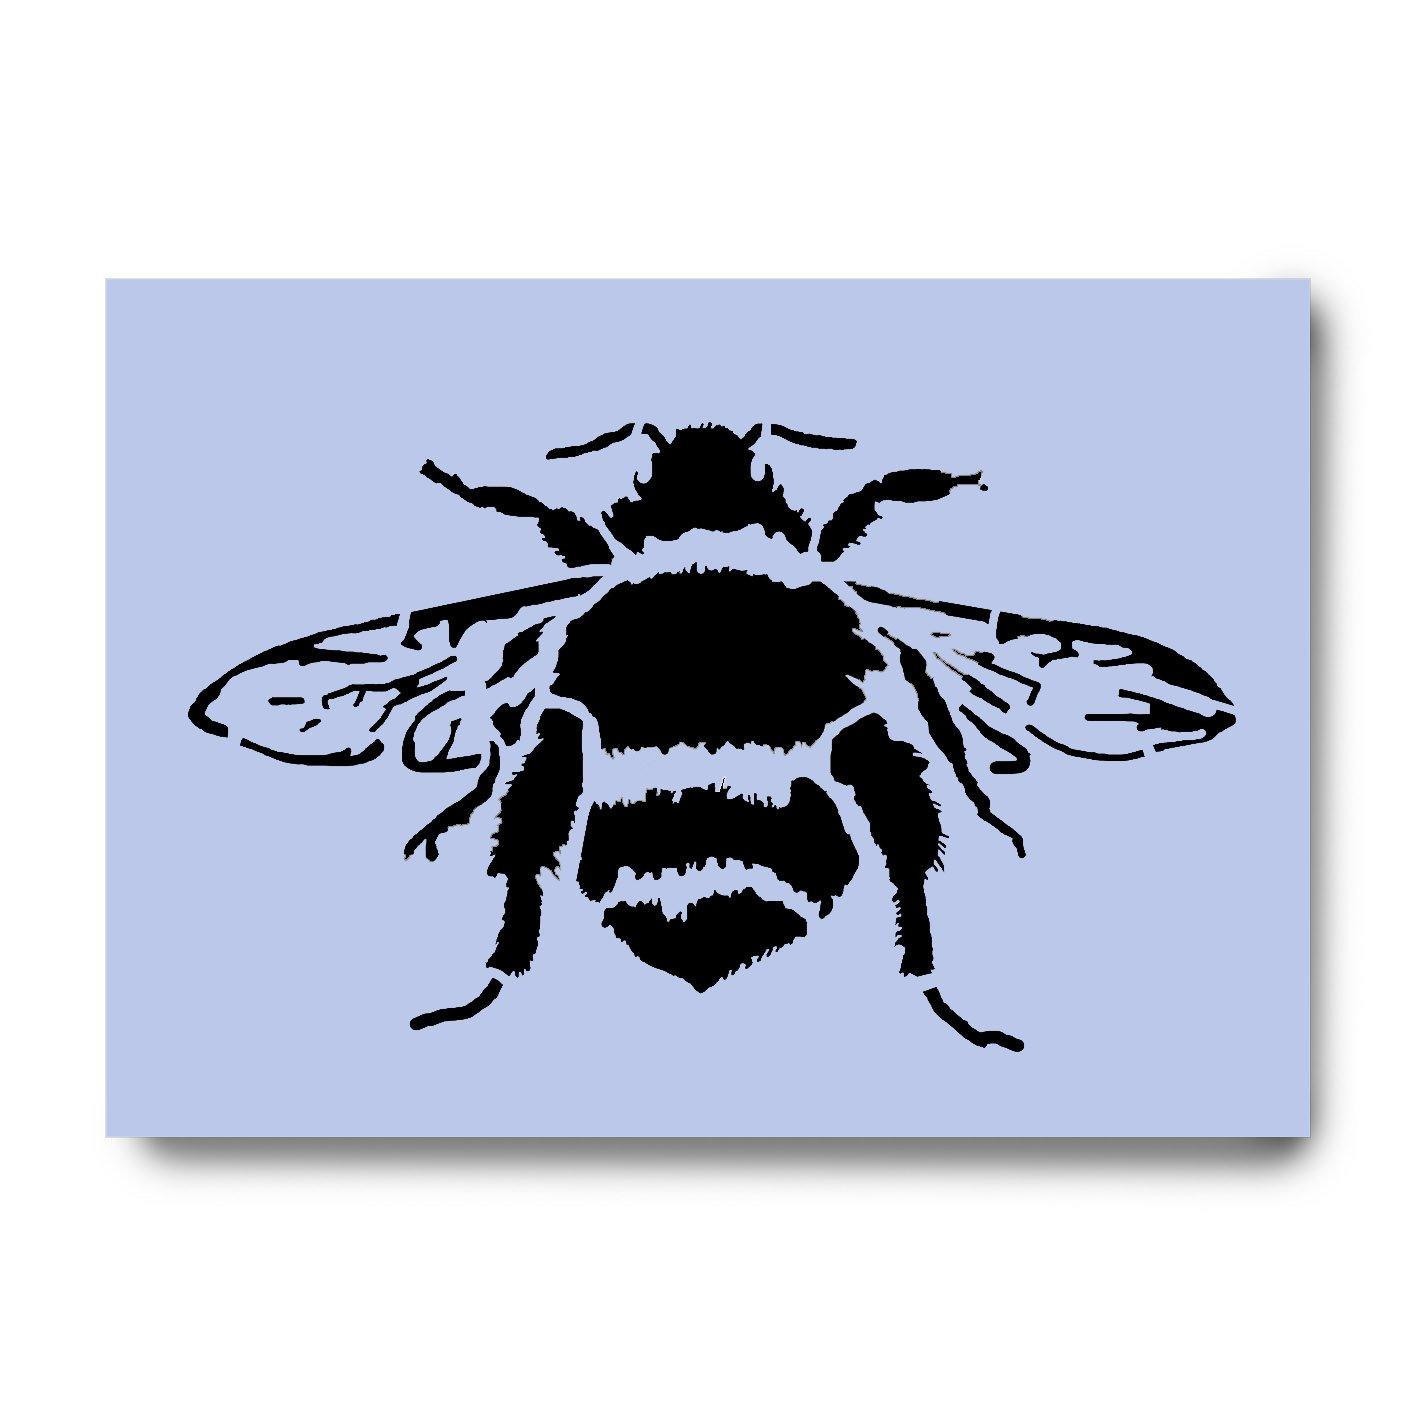 LITTLE BEE STENCIL A5 SIZE ON TOUGH FLEXIBLE STENCIL Dovetails